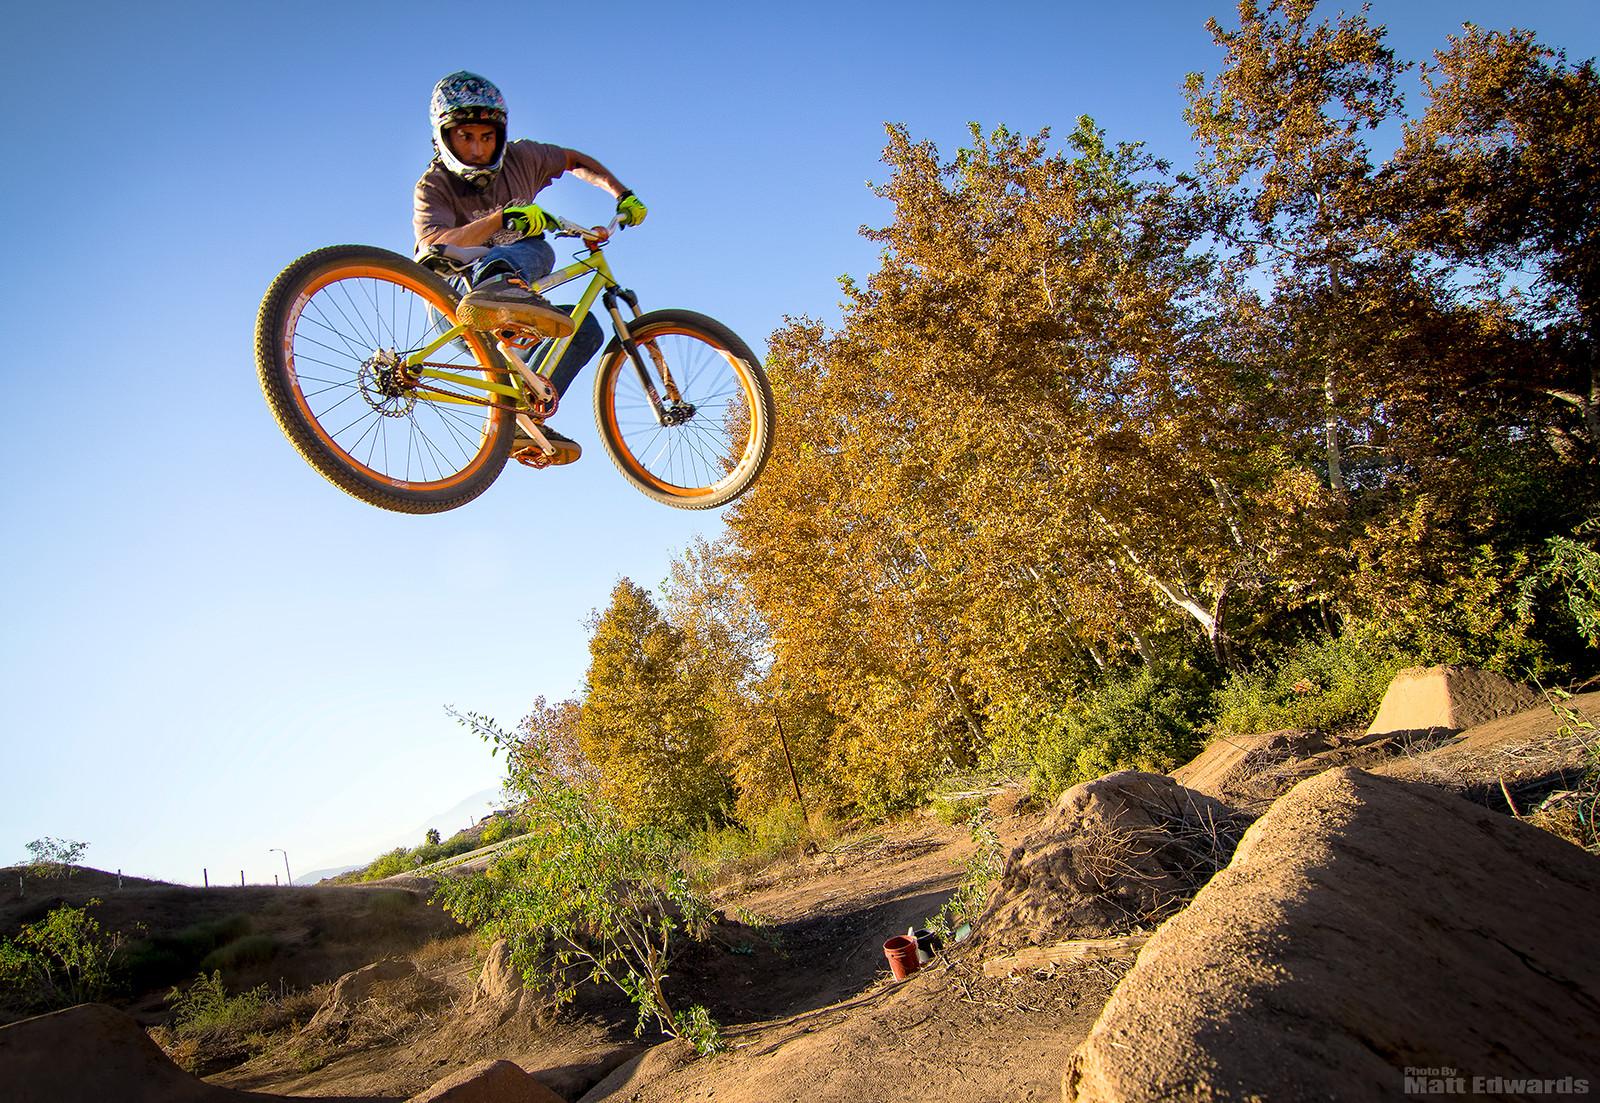 Alvino getting nasty! - EdwardsEntertainment - Mountain Biking Pictures - Vital MTB